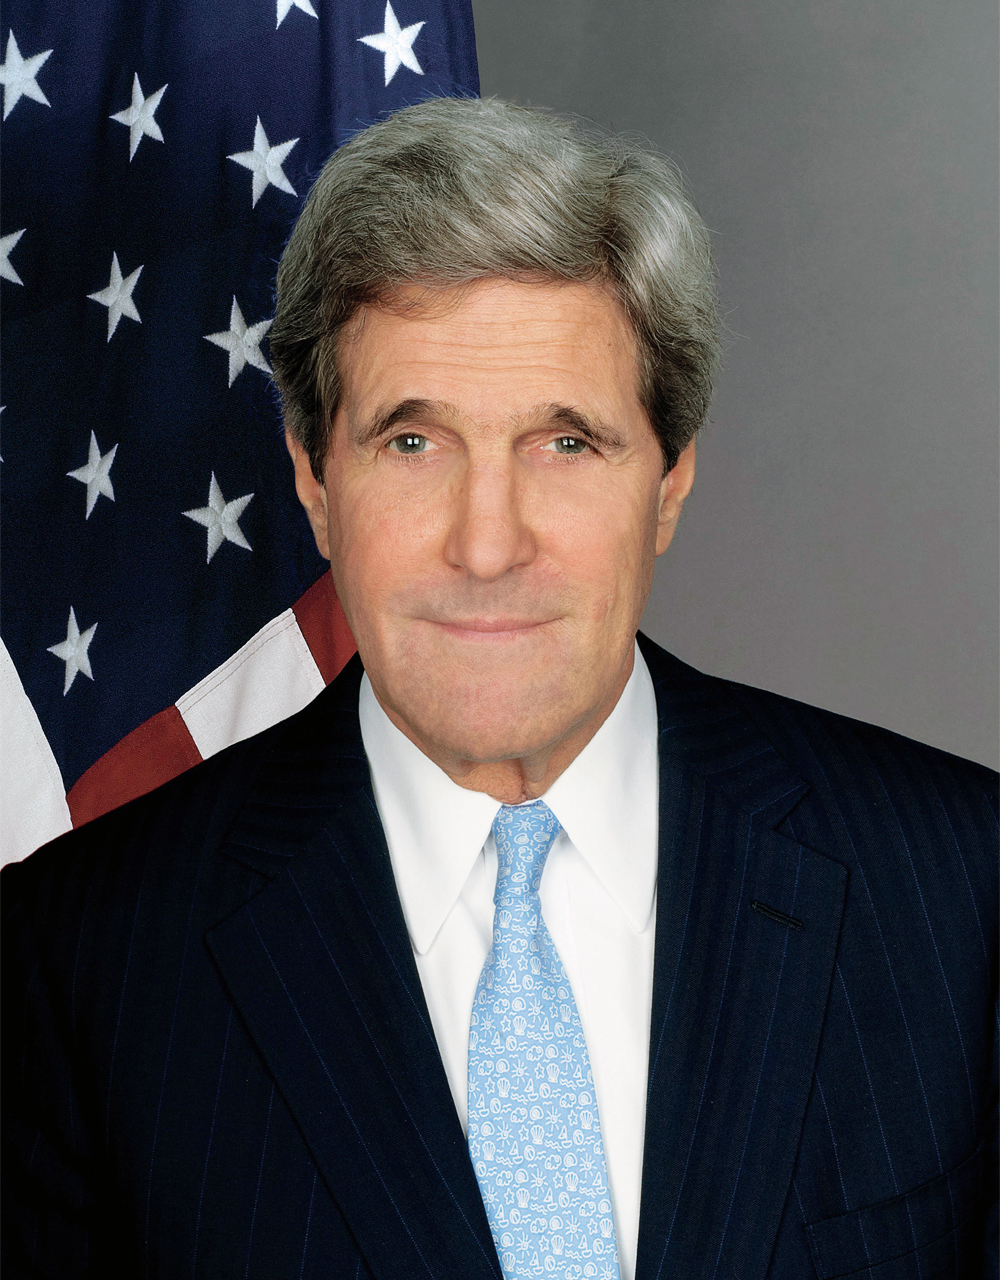 John Kerry file photo